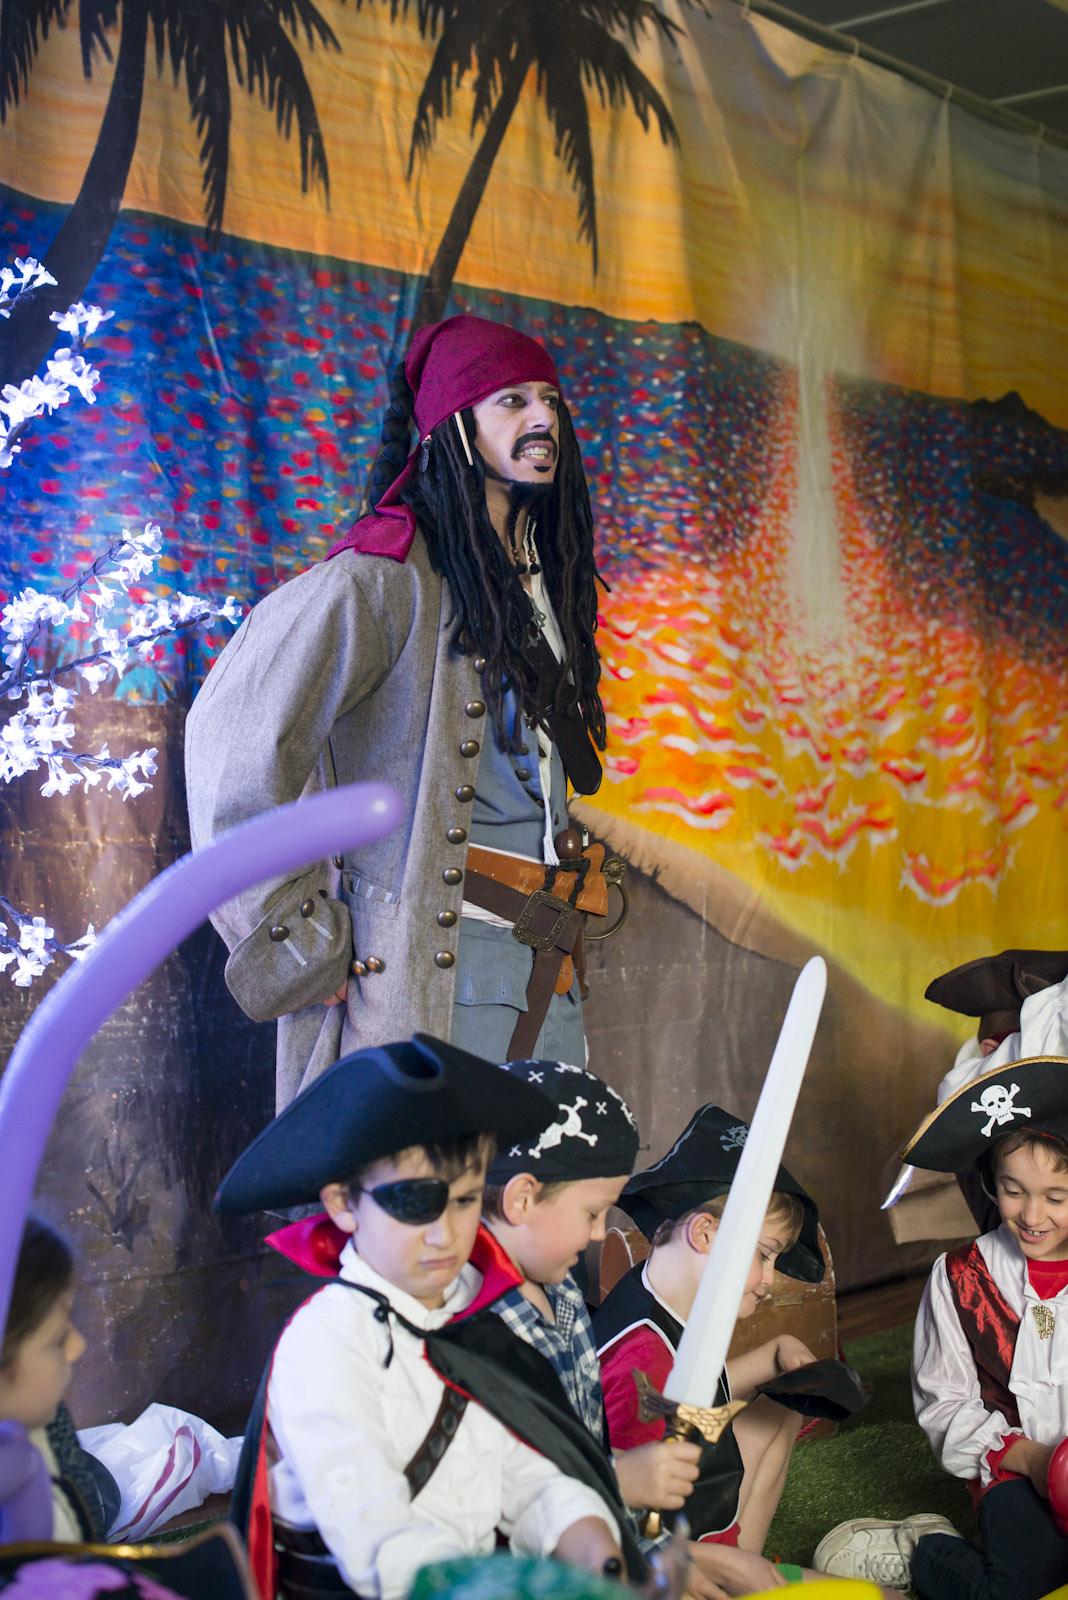 209DSC_6833 boston pirate.jpg